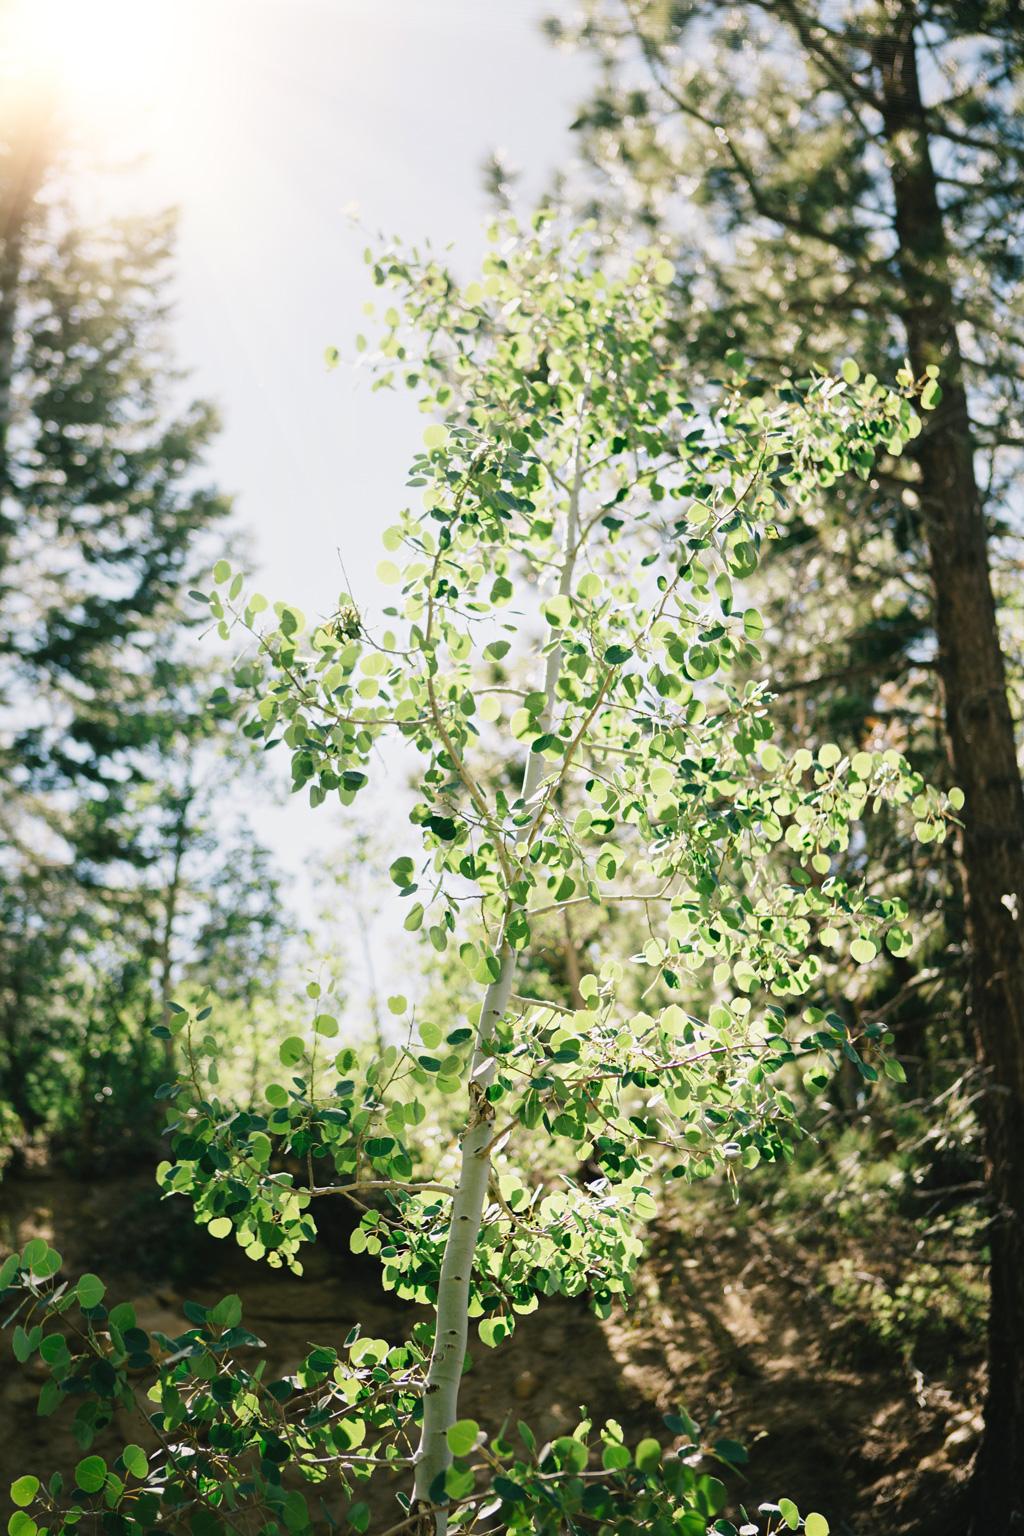 CindyGiovagnoli_Galena_Creek_Visitors_Center_hike_Reno_Tahoe_Nevada_outdoor_activities-014.jpg